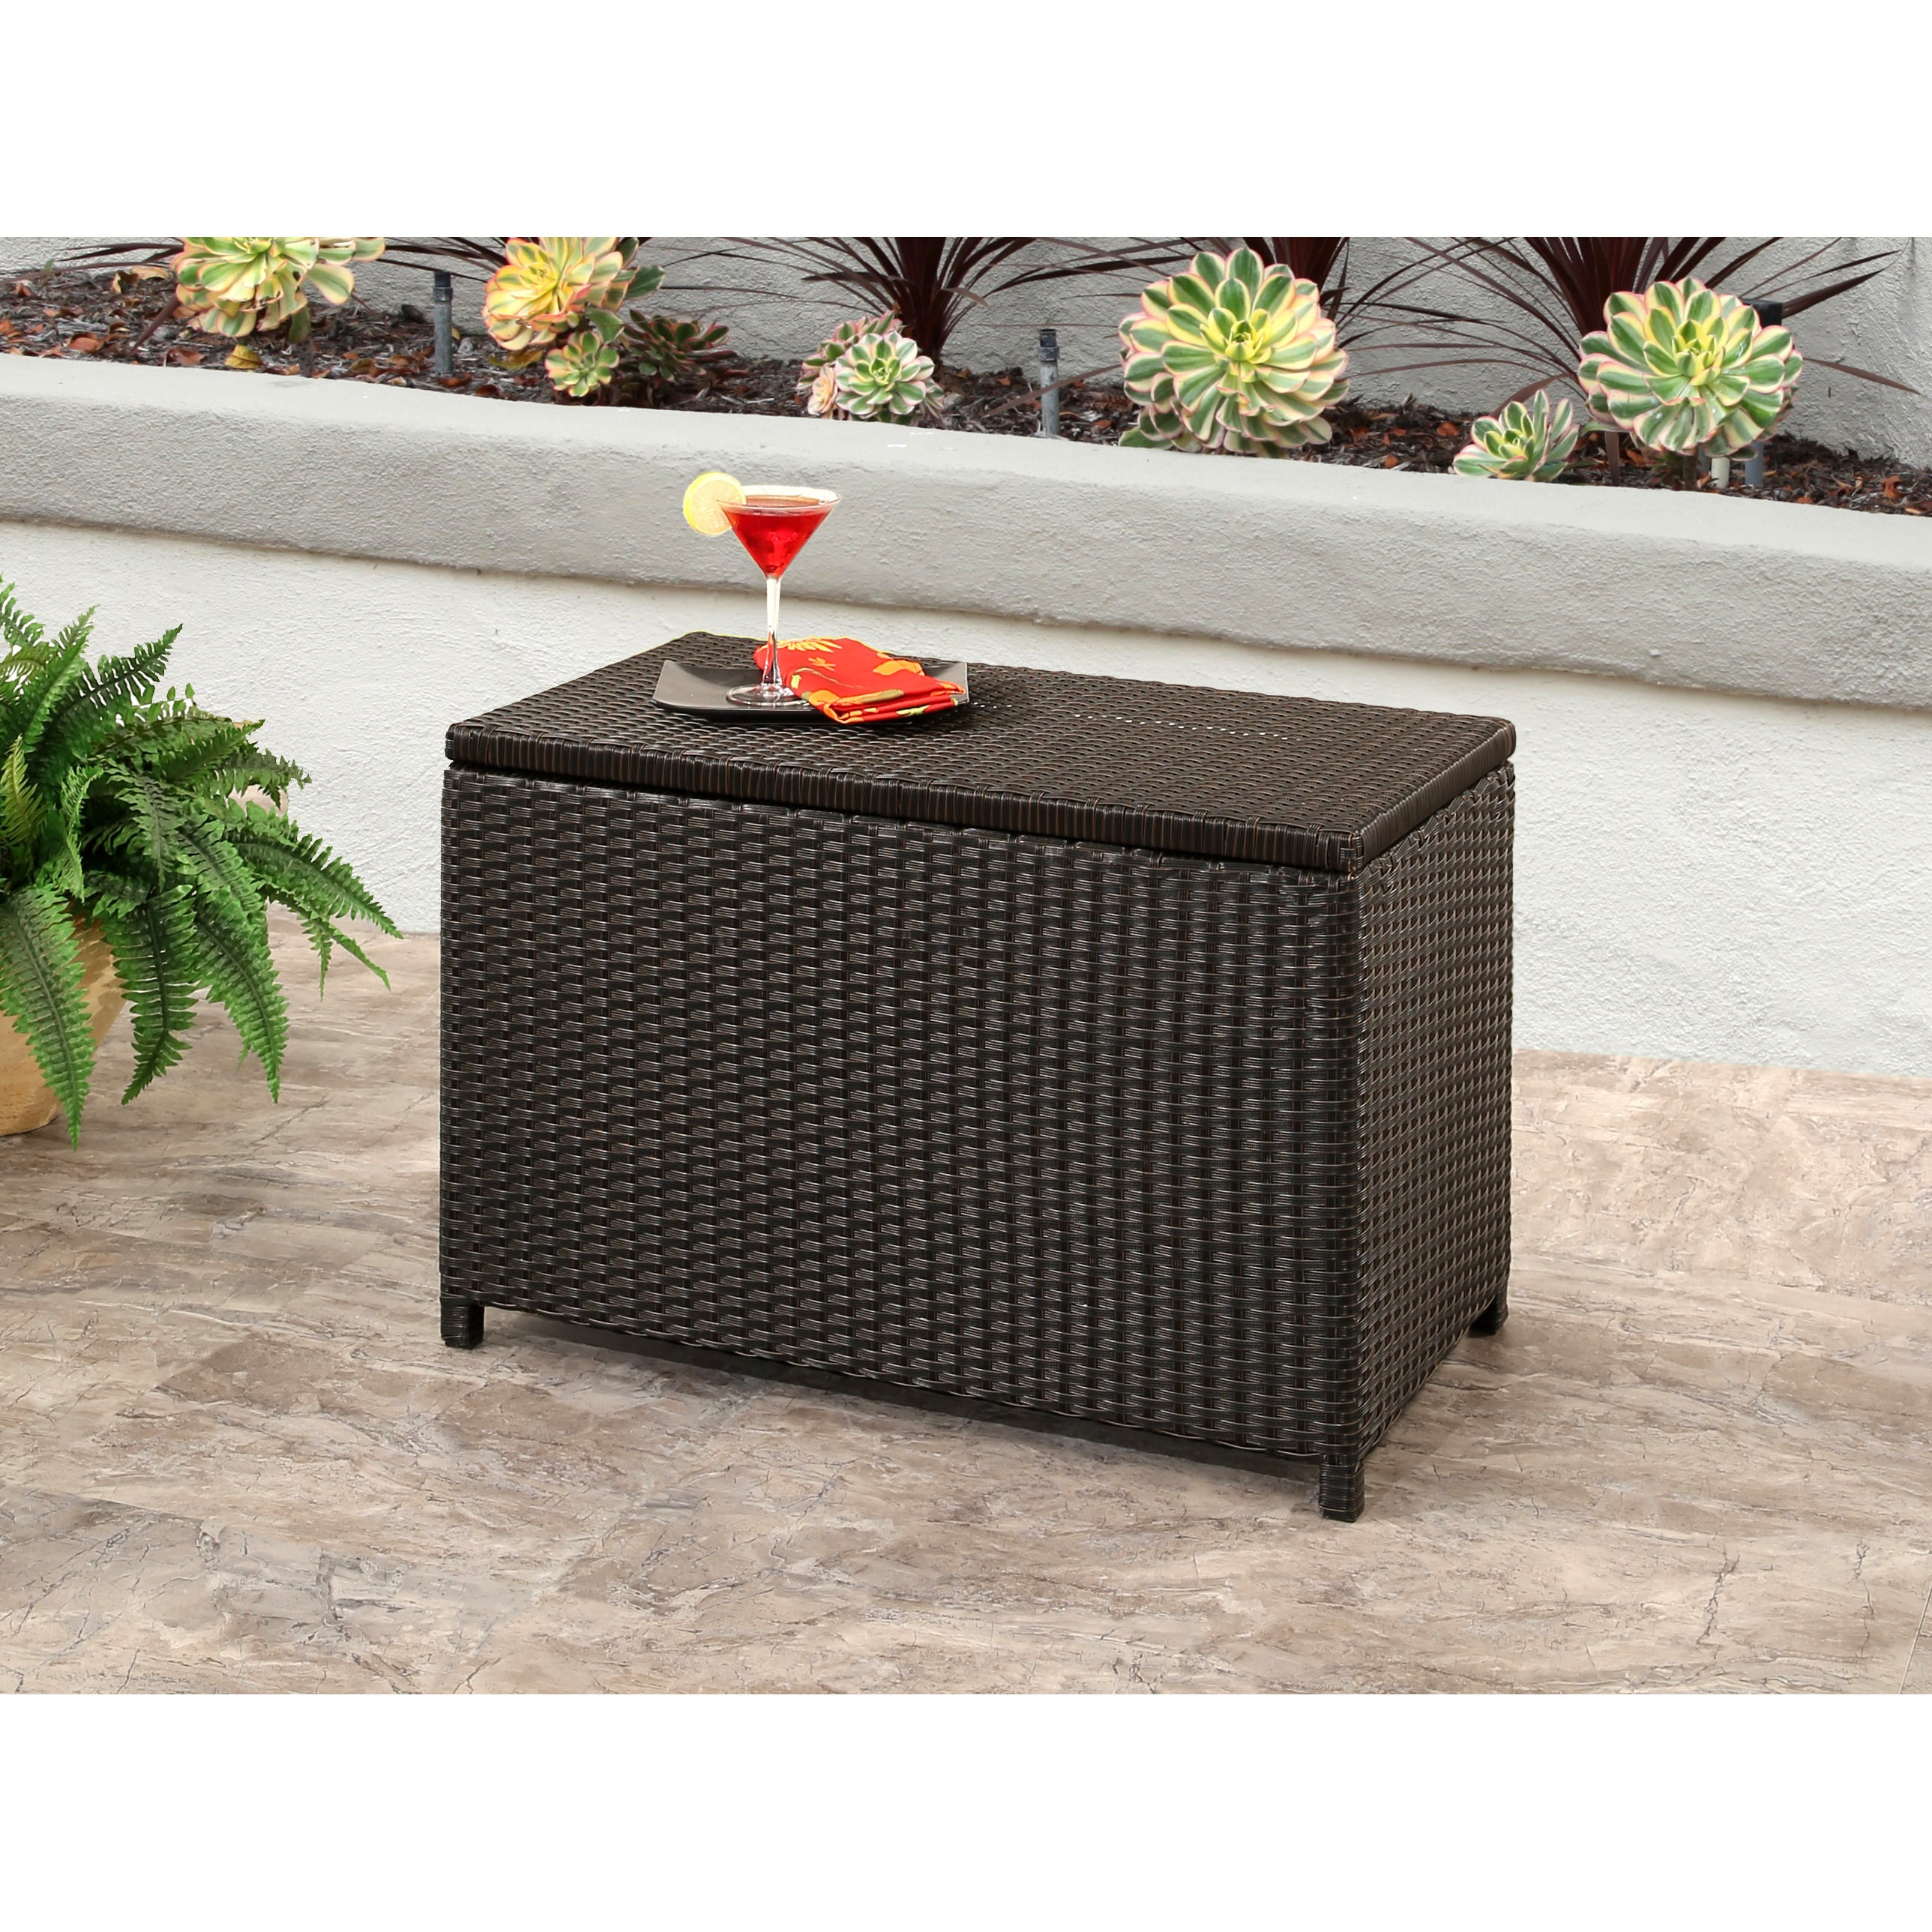 Abbyson provence outdoor storage ottoman